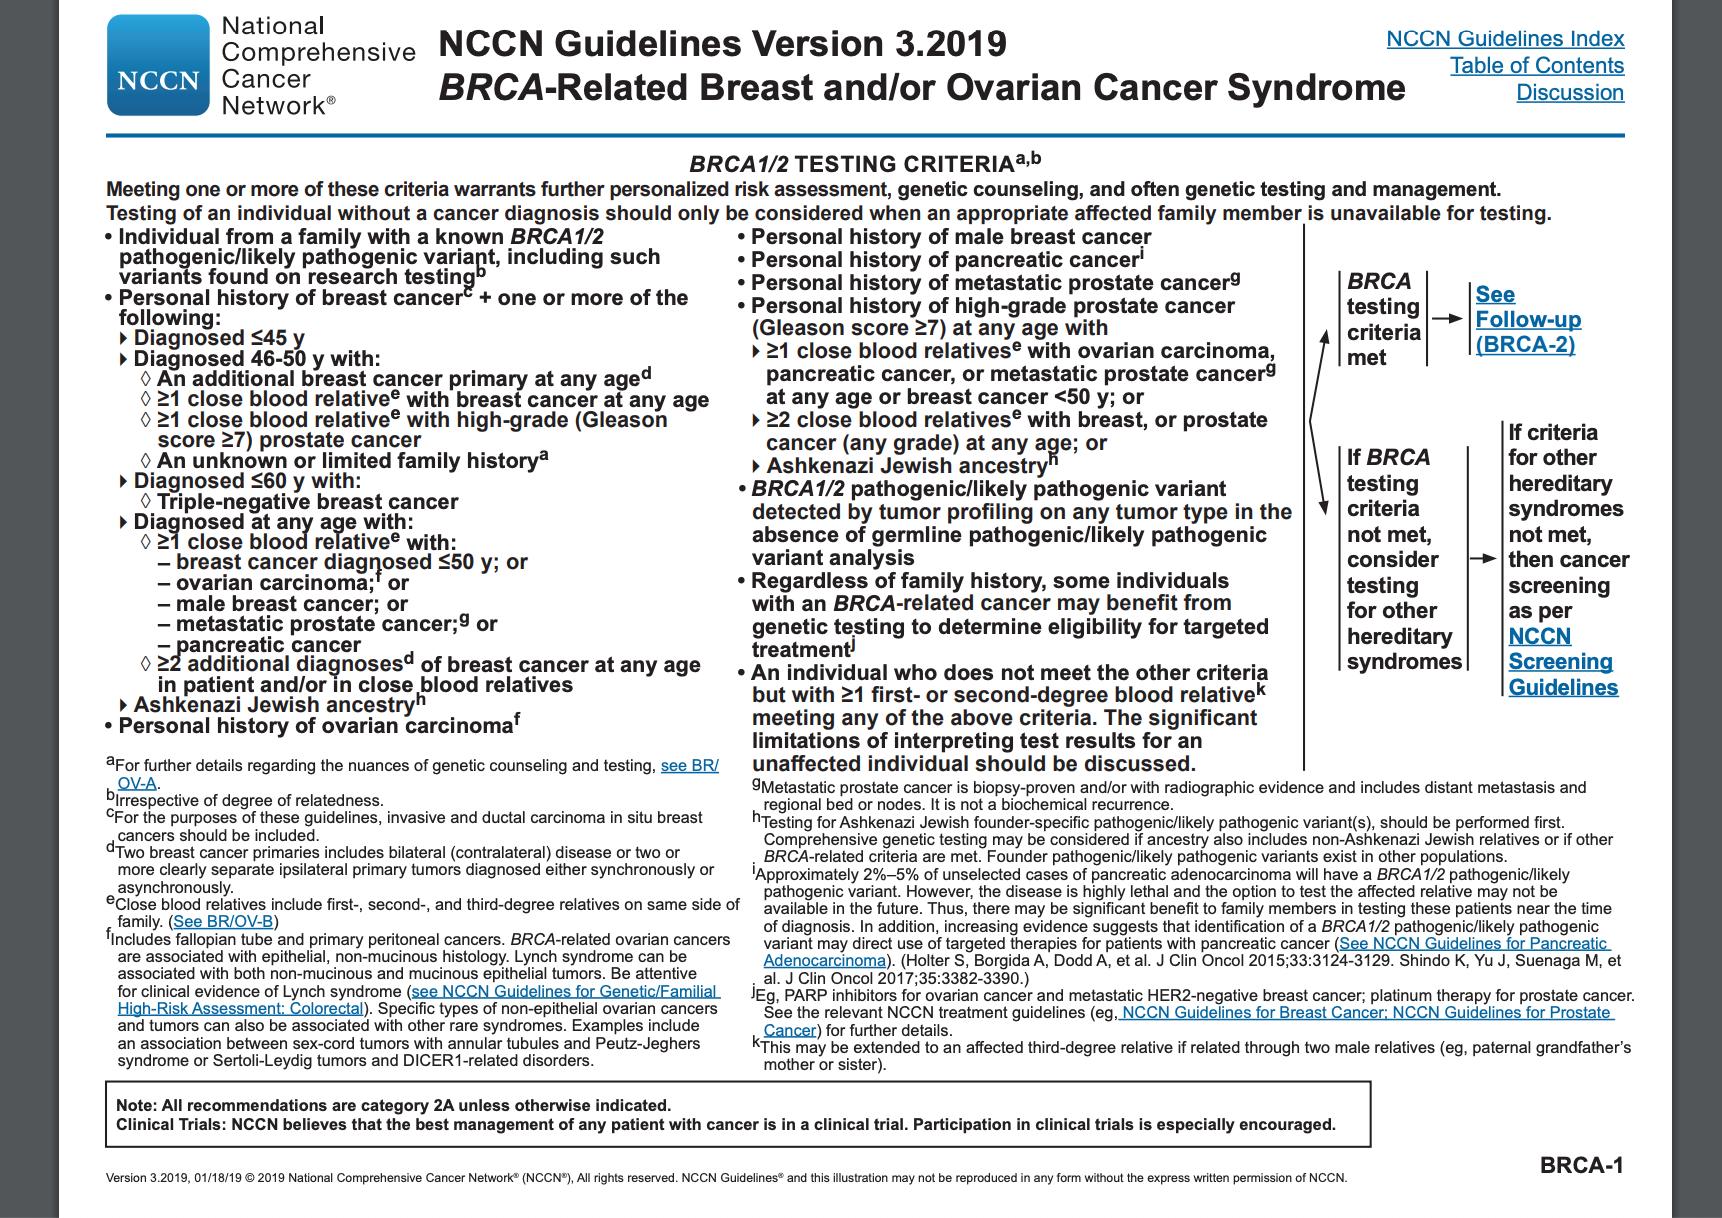 Familial cancer risk assessment tool - Familial cancer risk